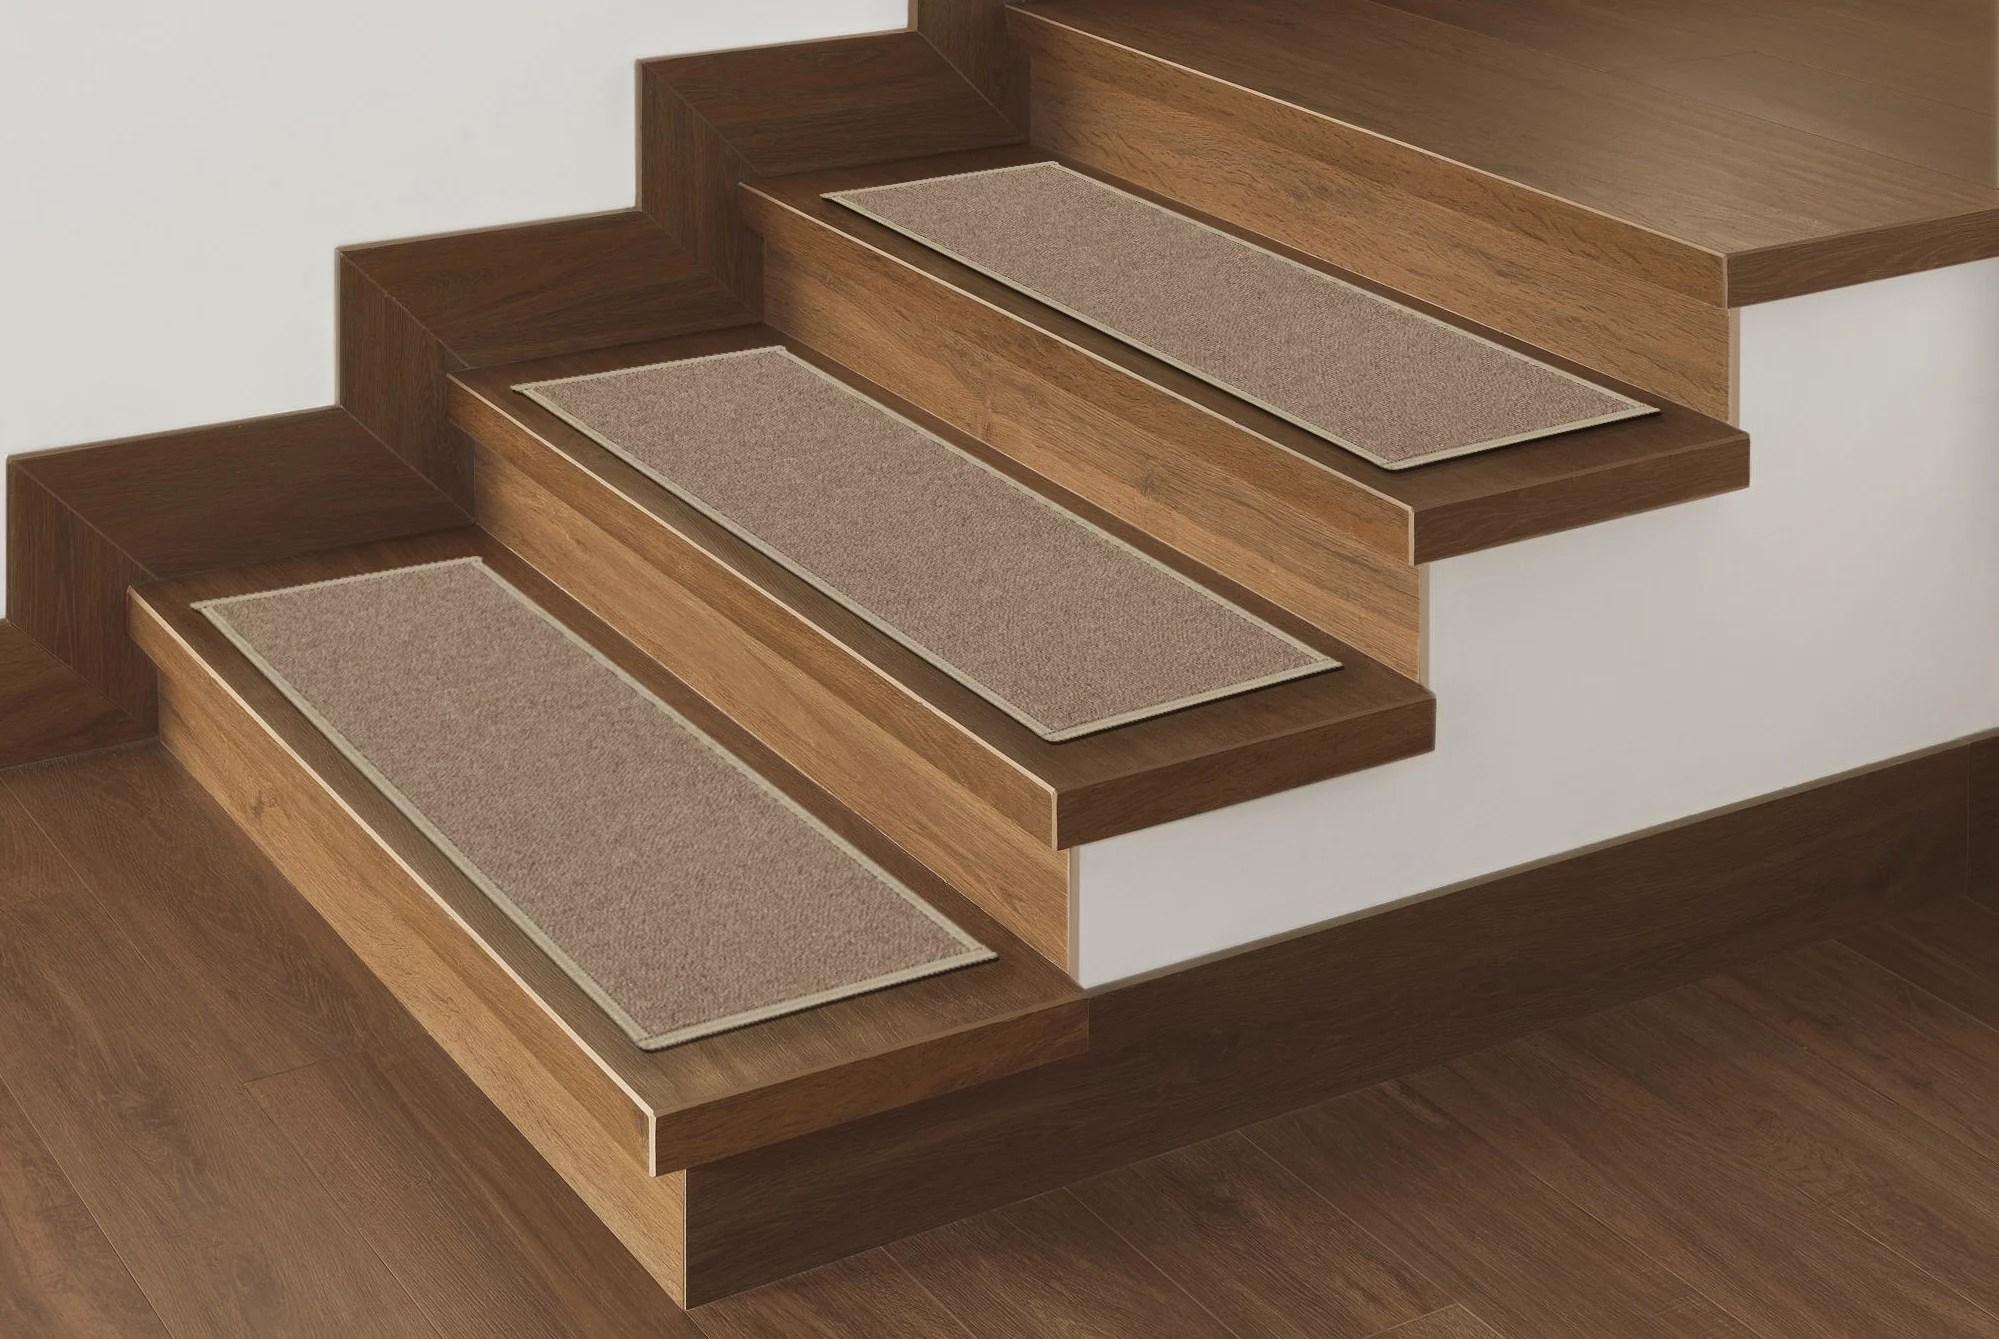 Ottomanson Non Slip Rubber Backing Stair Tread Dark Beige 8 5 X | Dark Wood Stair Treads | Timber | White Handrail | Dark Stained | Natural Wood | Wood Finish